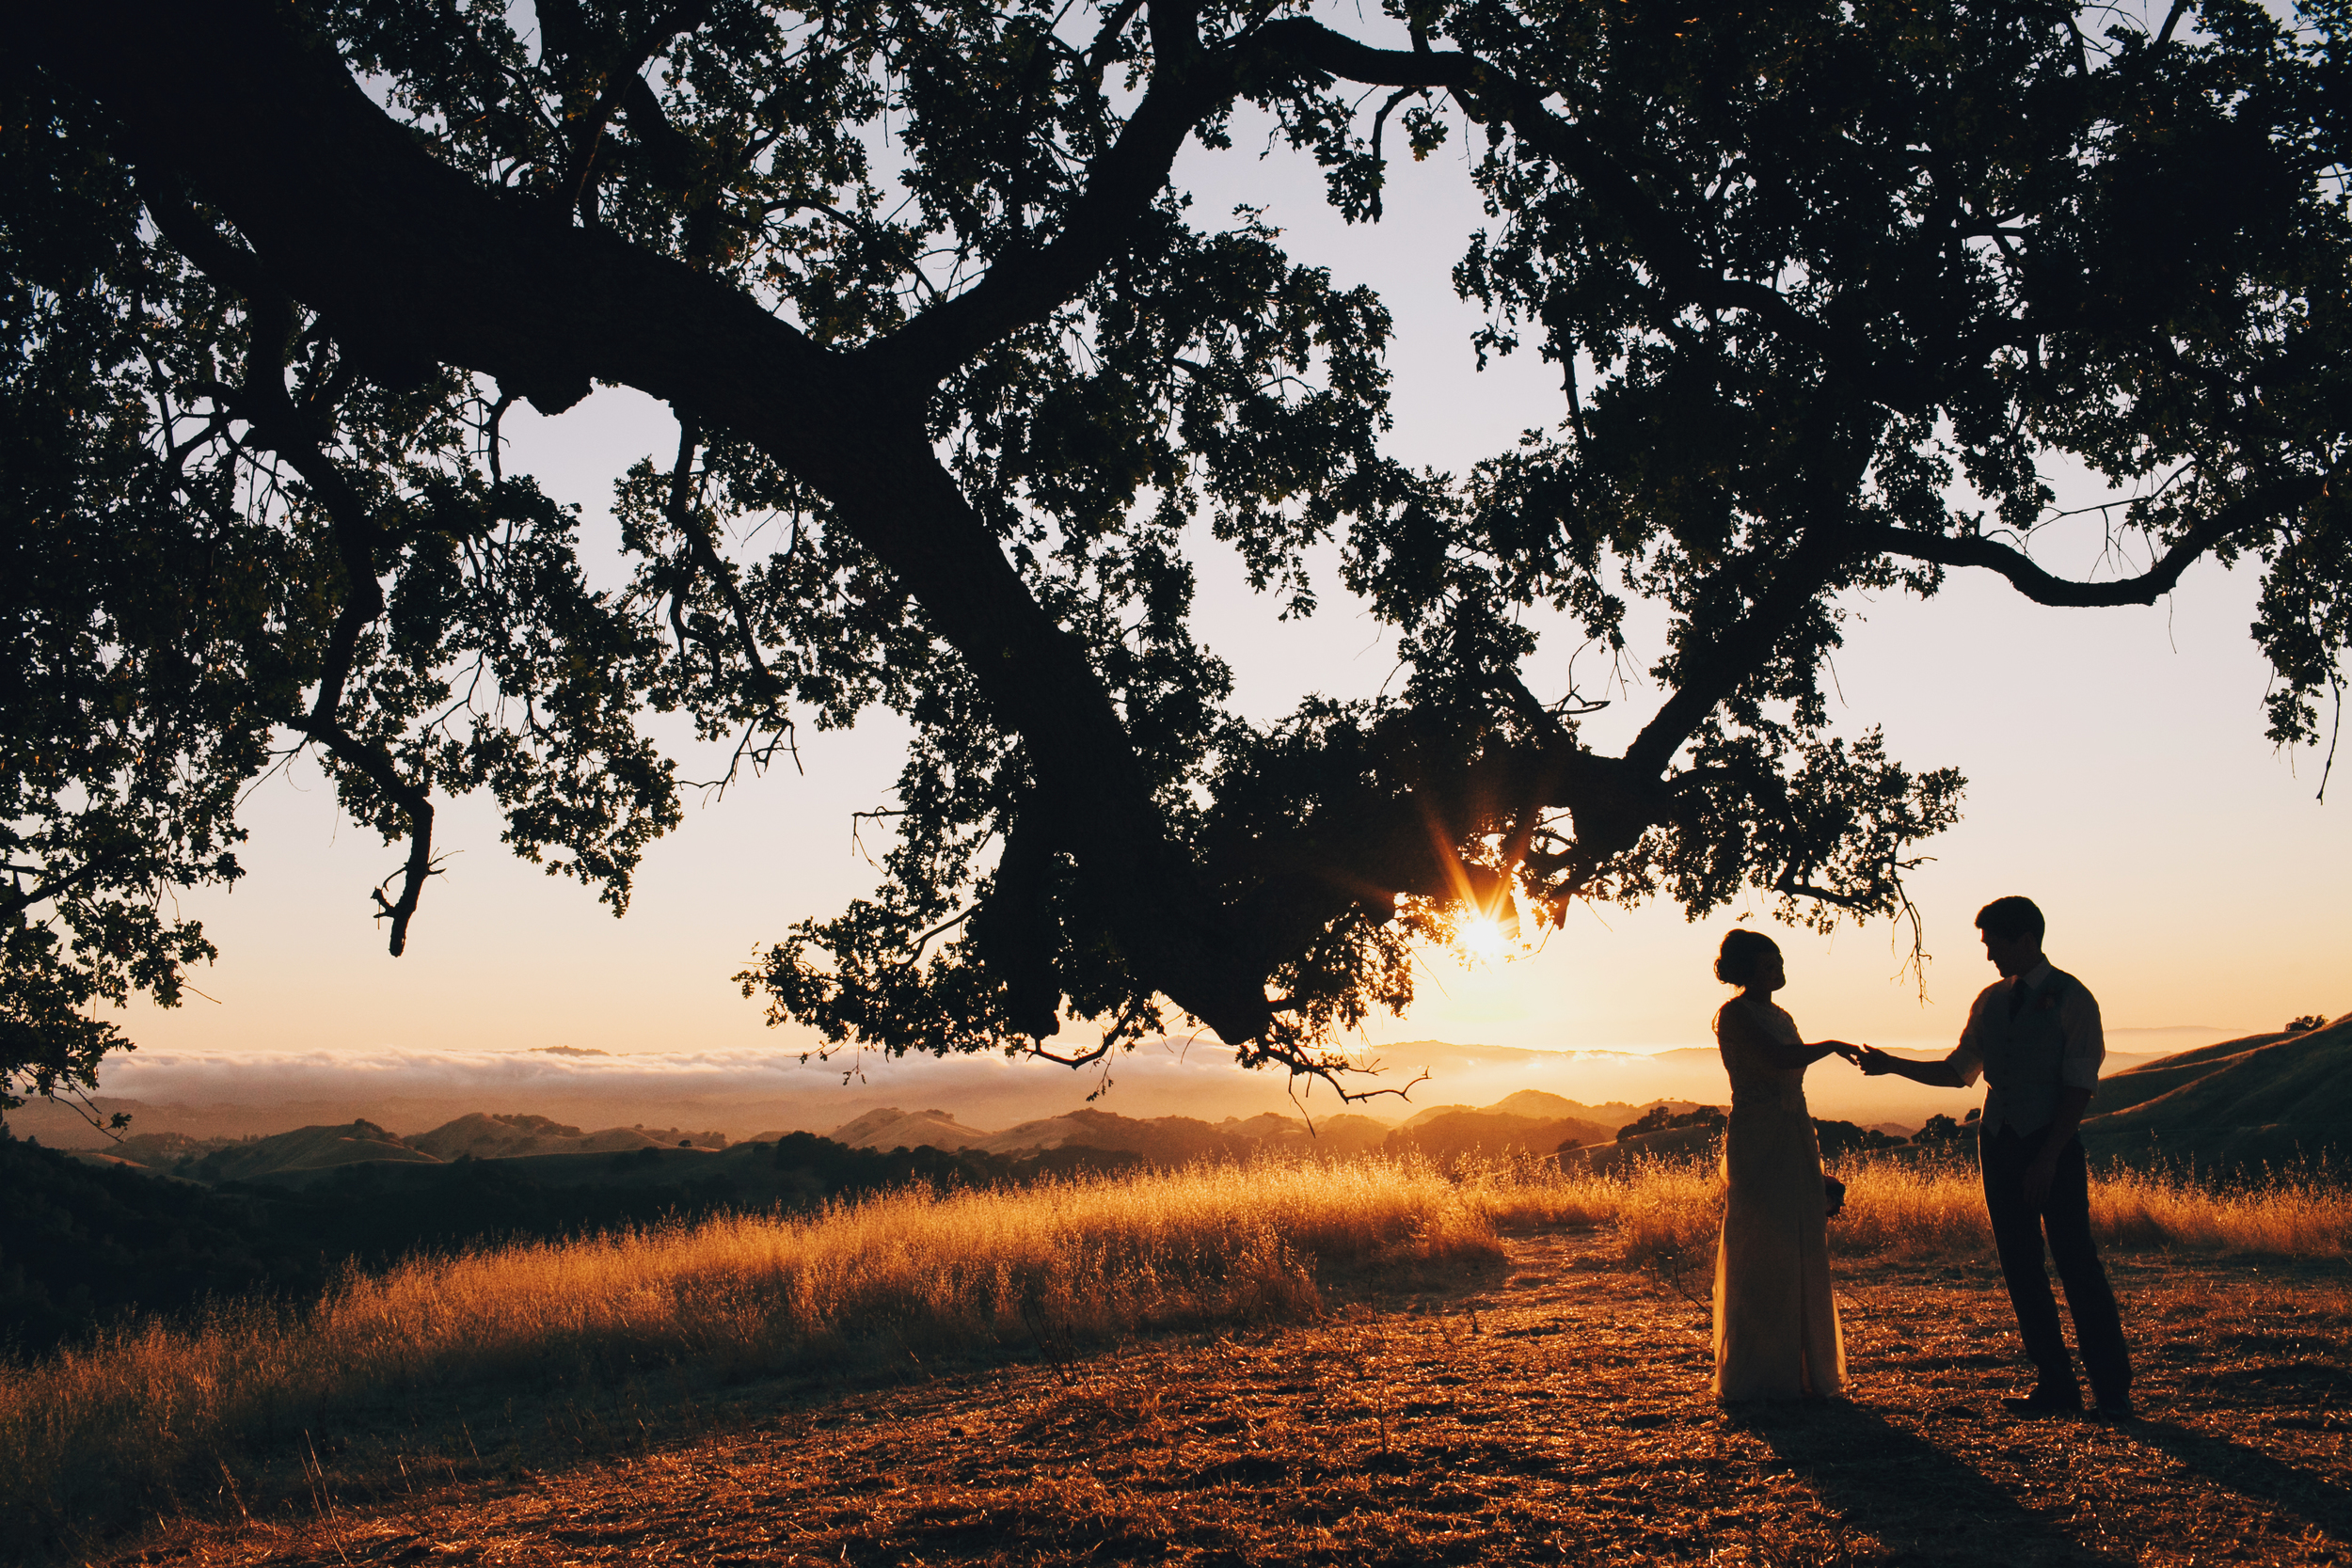 Diablo_Ranch_Wedding_Photography_Becky_Will-10.JPG